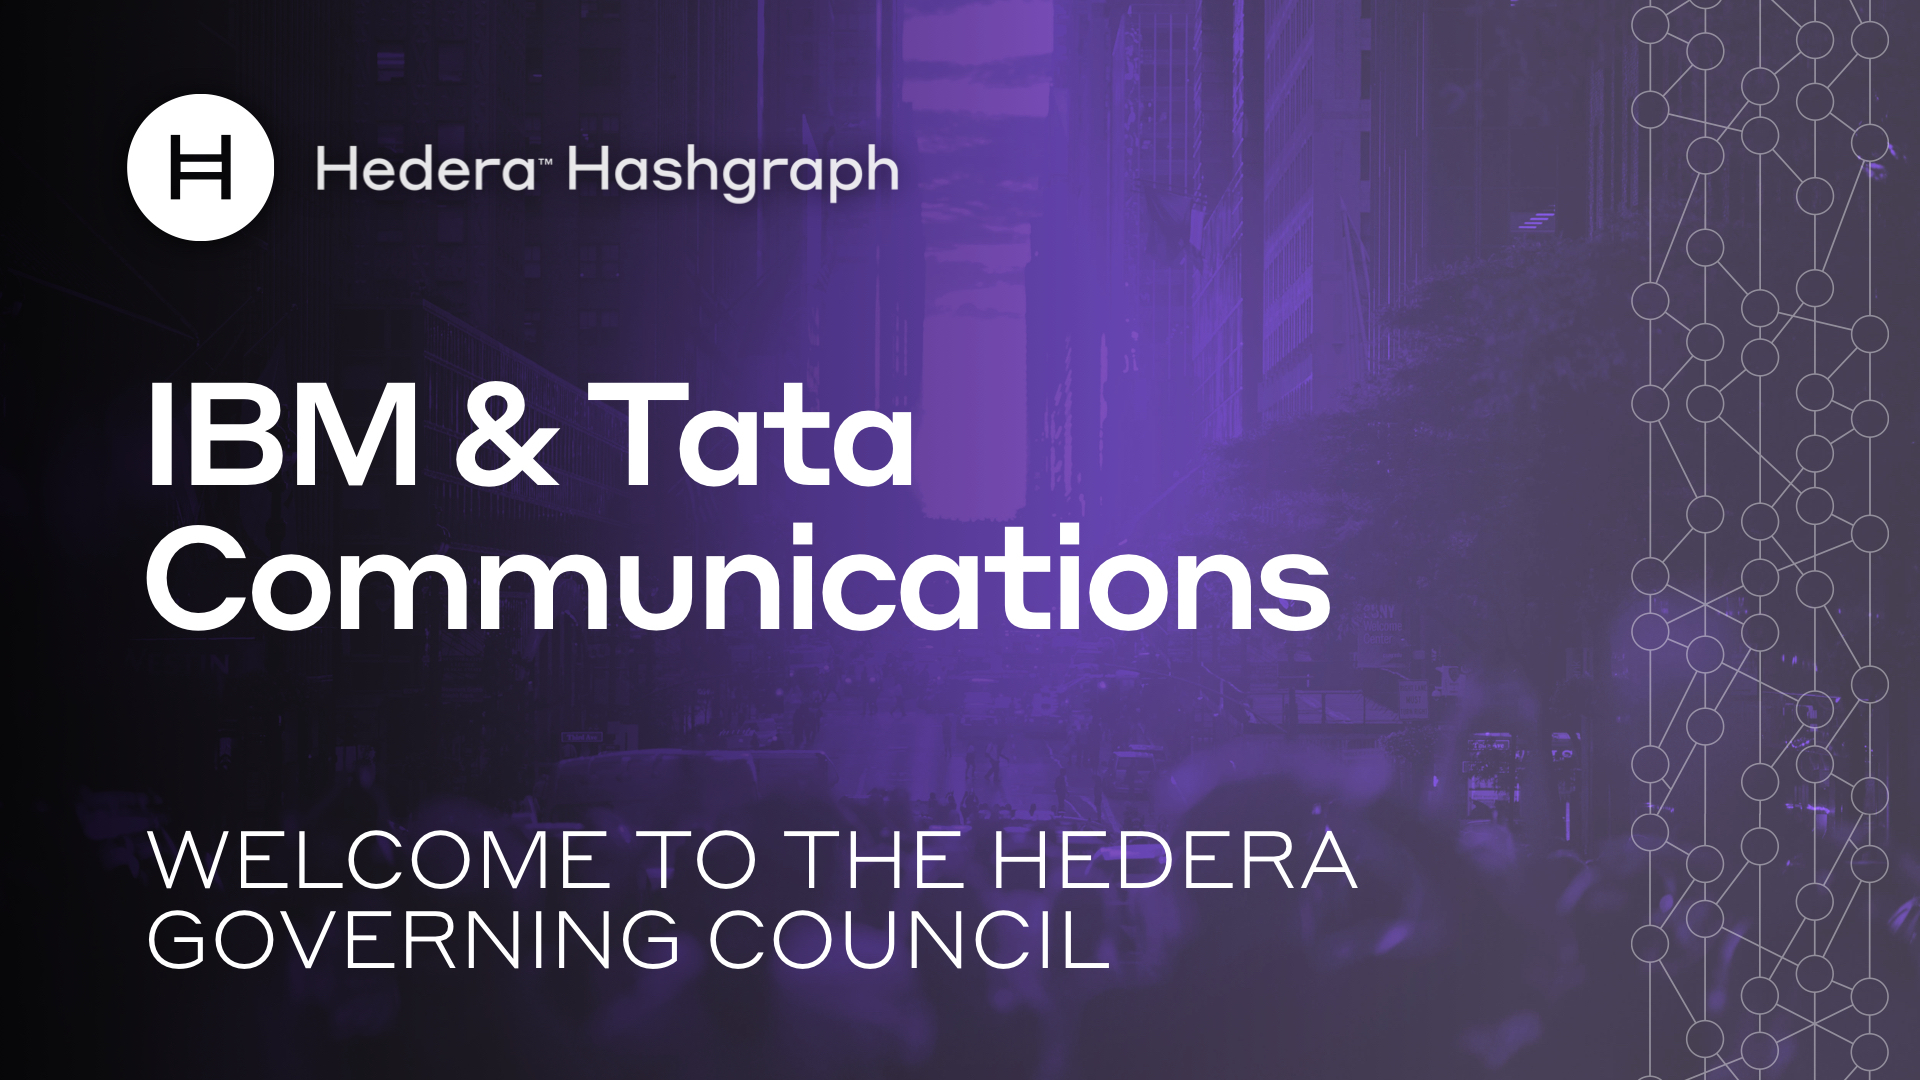 Hedera accredited crowdsale FAQ